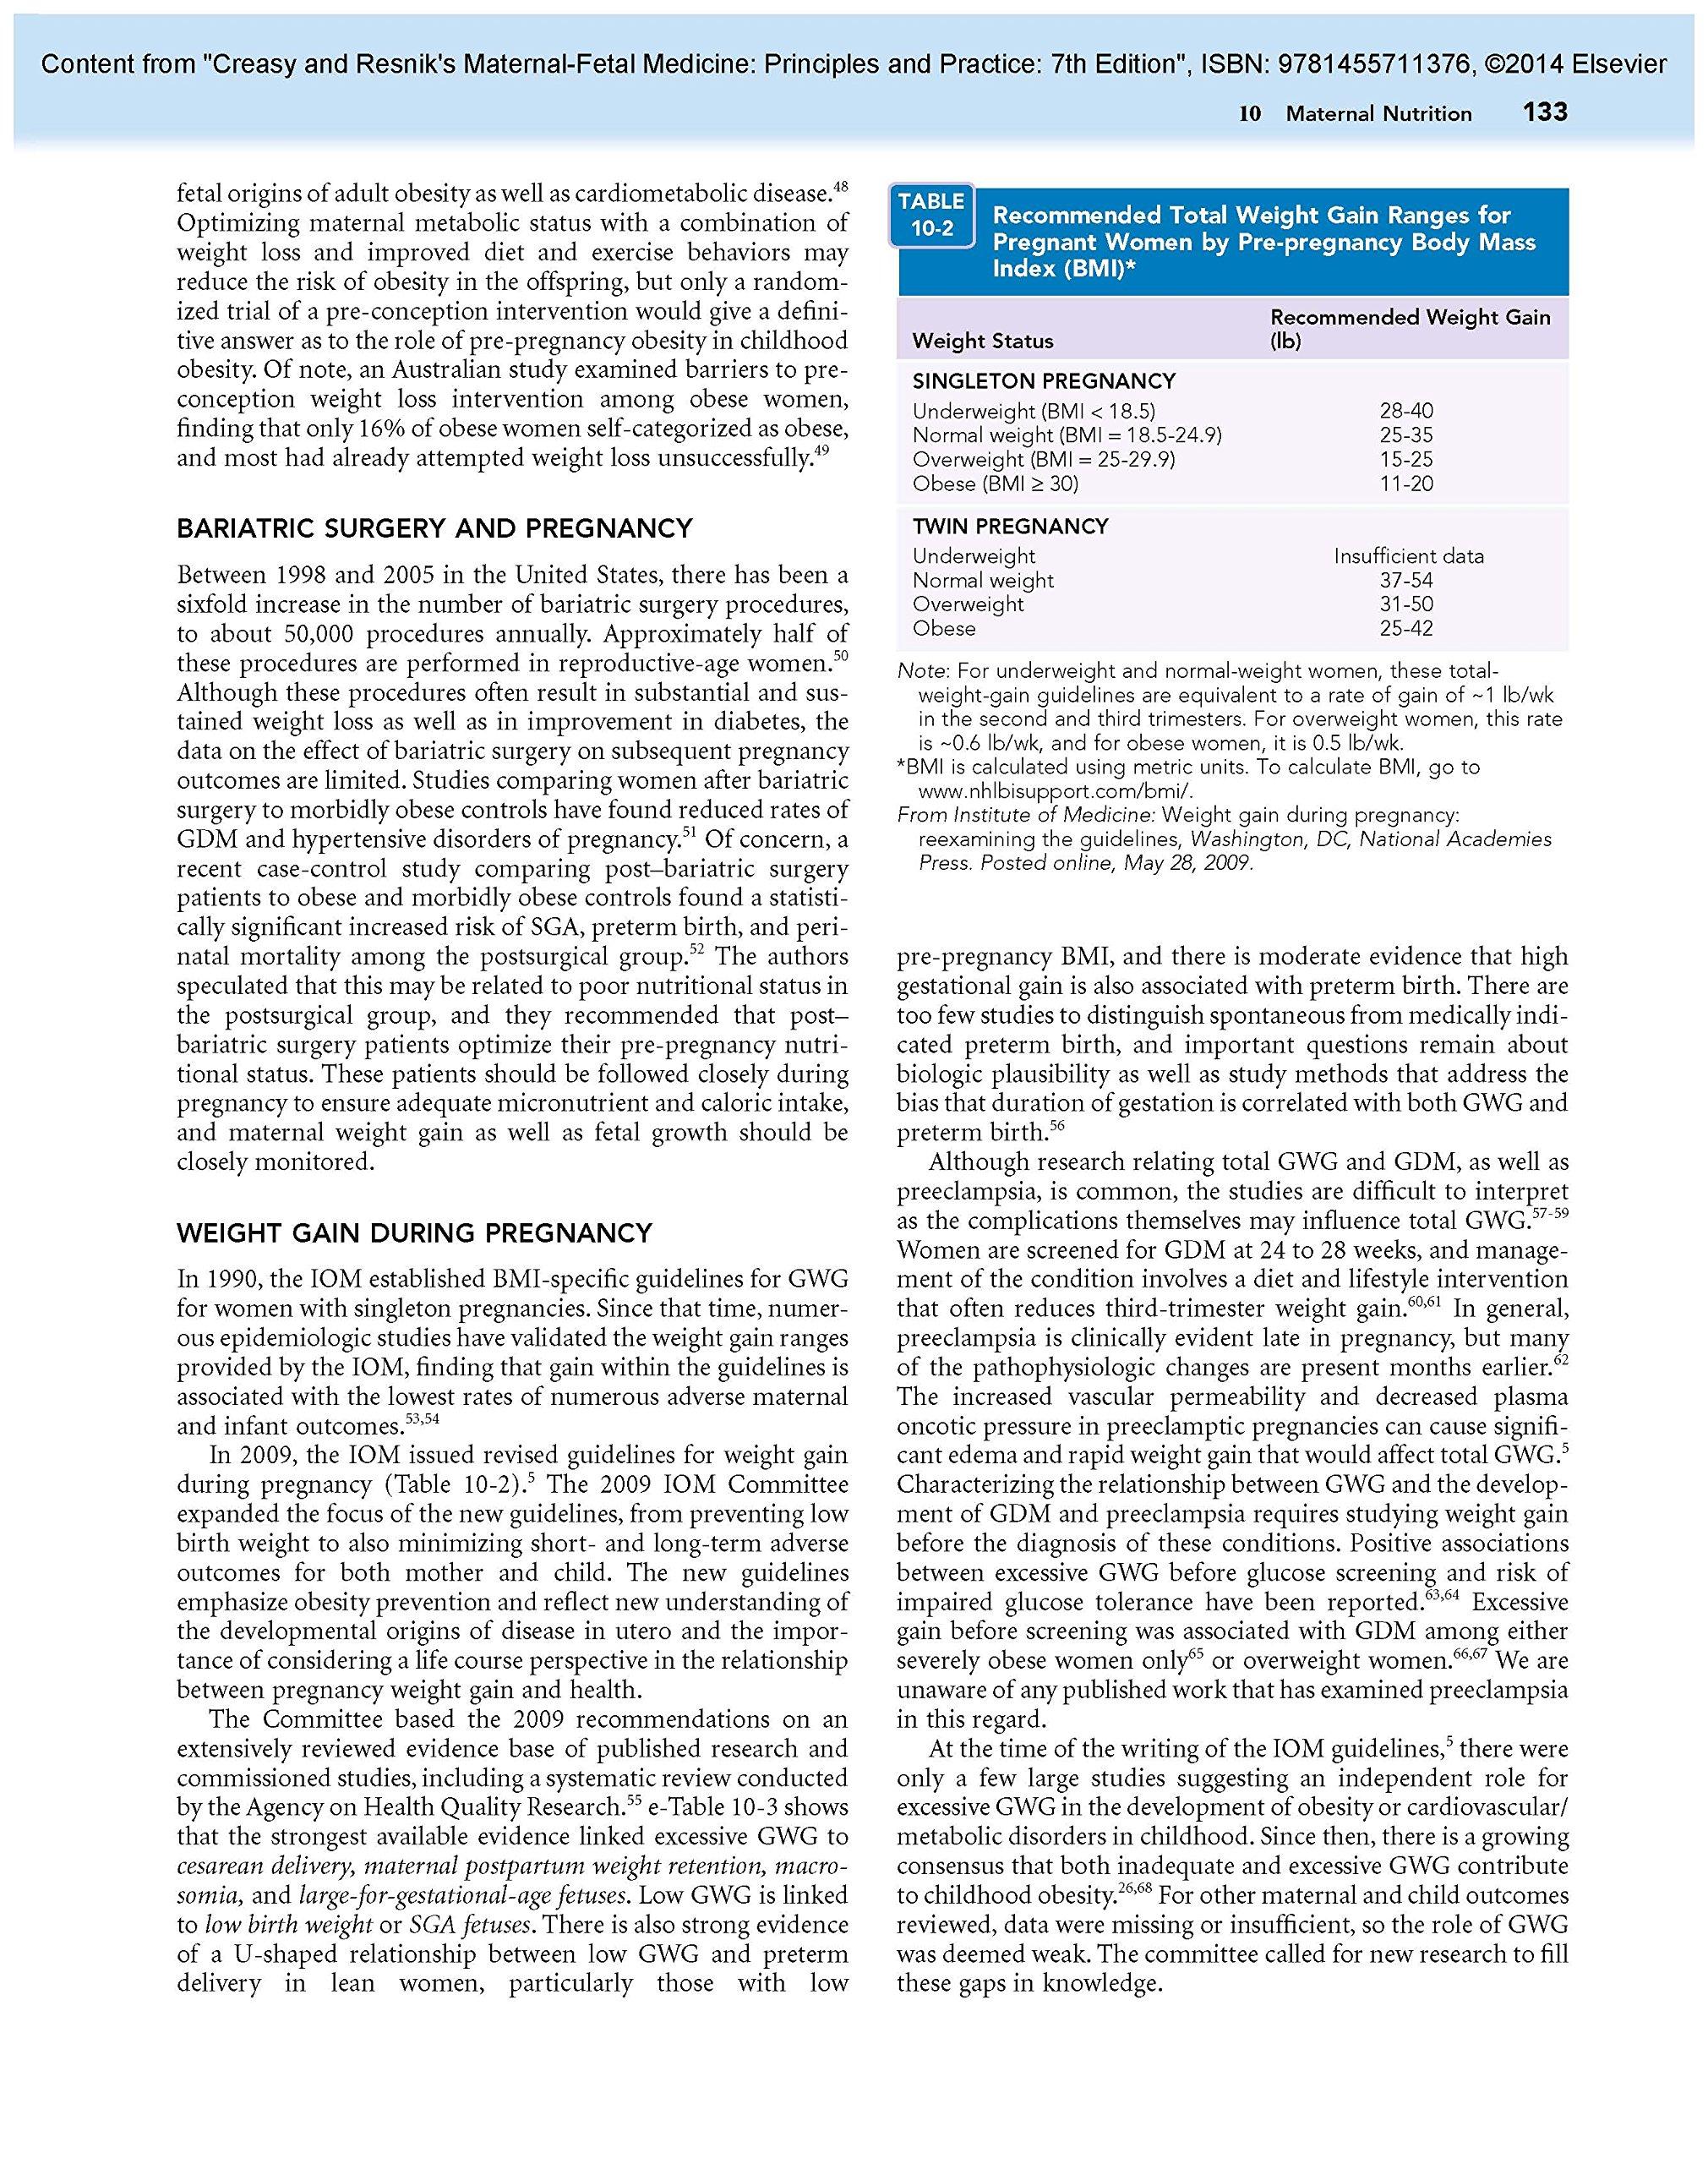 Creasy and Resnik's Maternal-Fetal Medicine: Principles and Practice, 7e